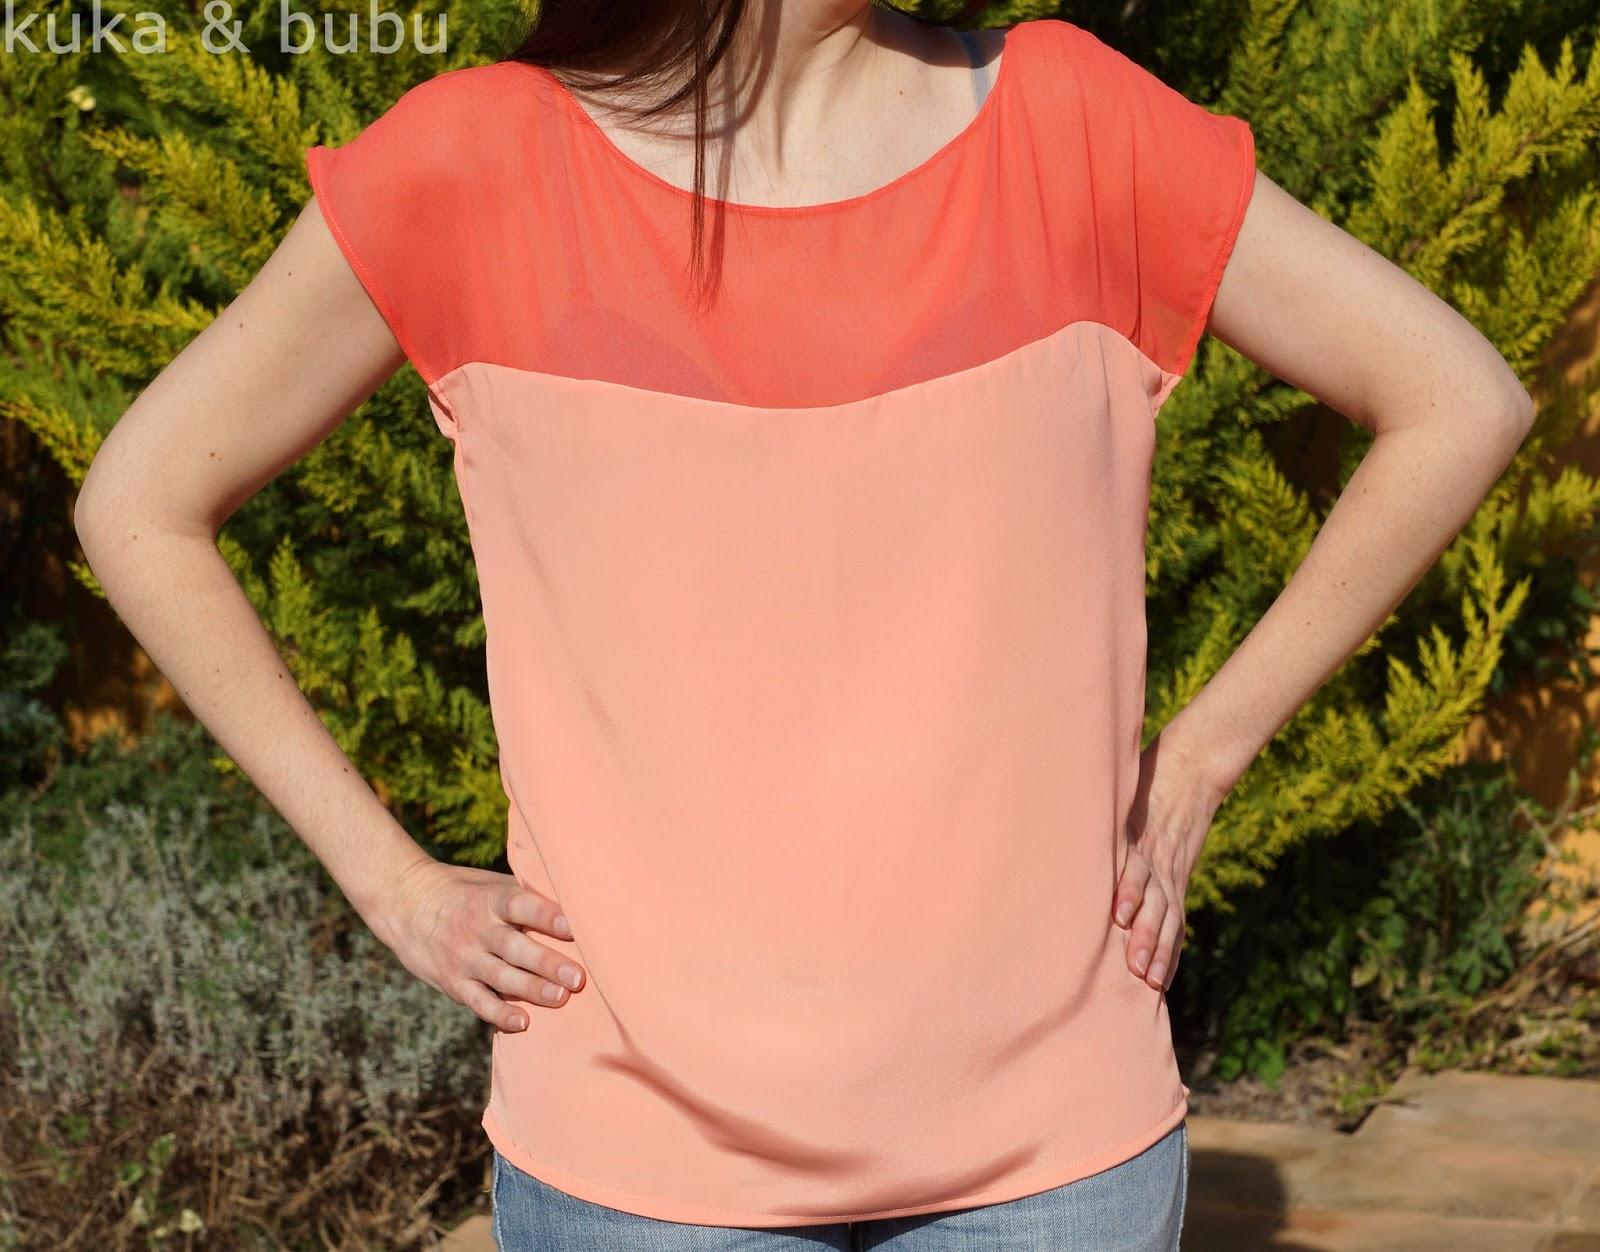 http://kukaandbubu.blogspot.com.es/2014/04/sheer-yoke-shirt-blusa-con-canesu.html